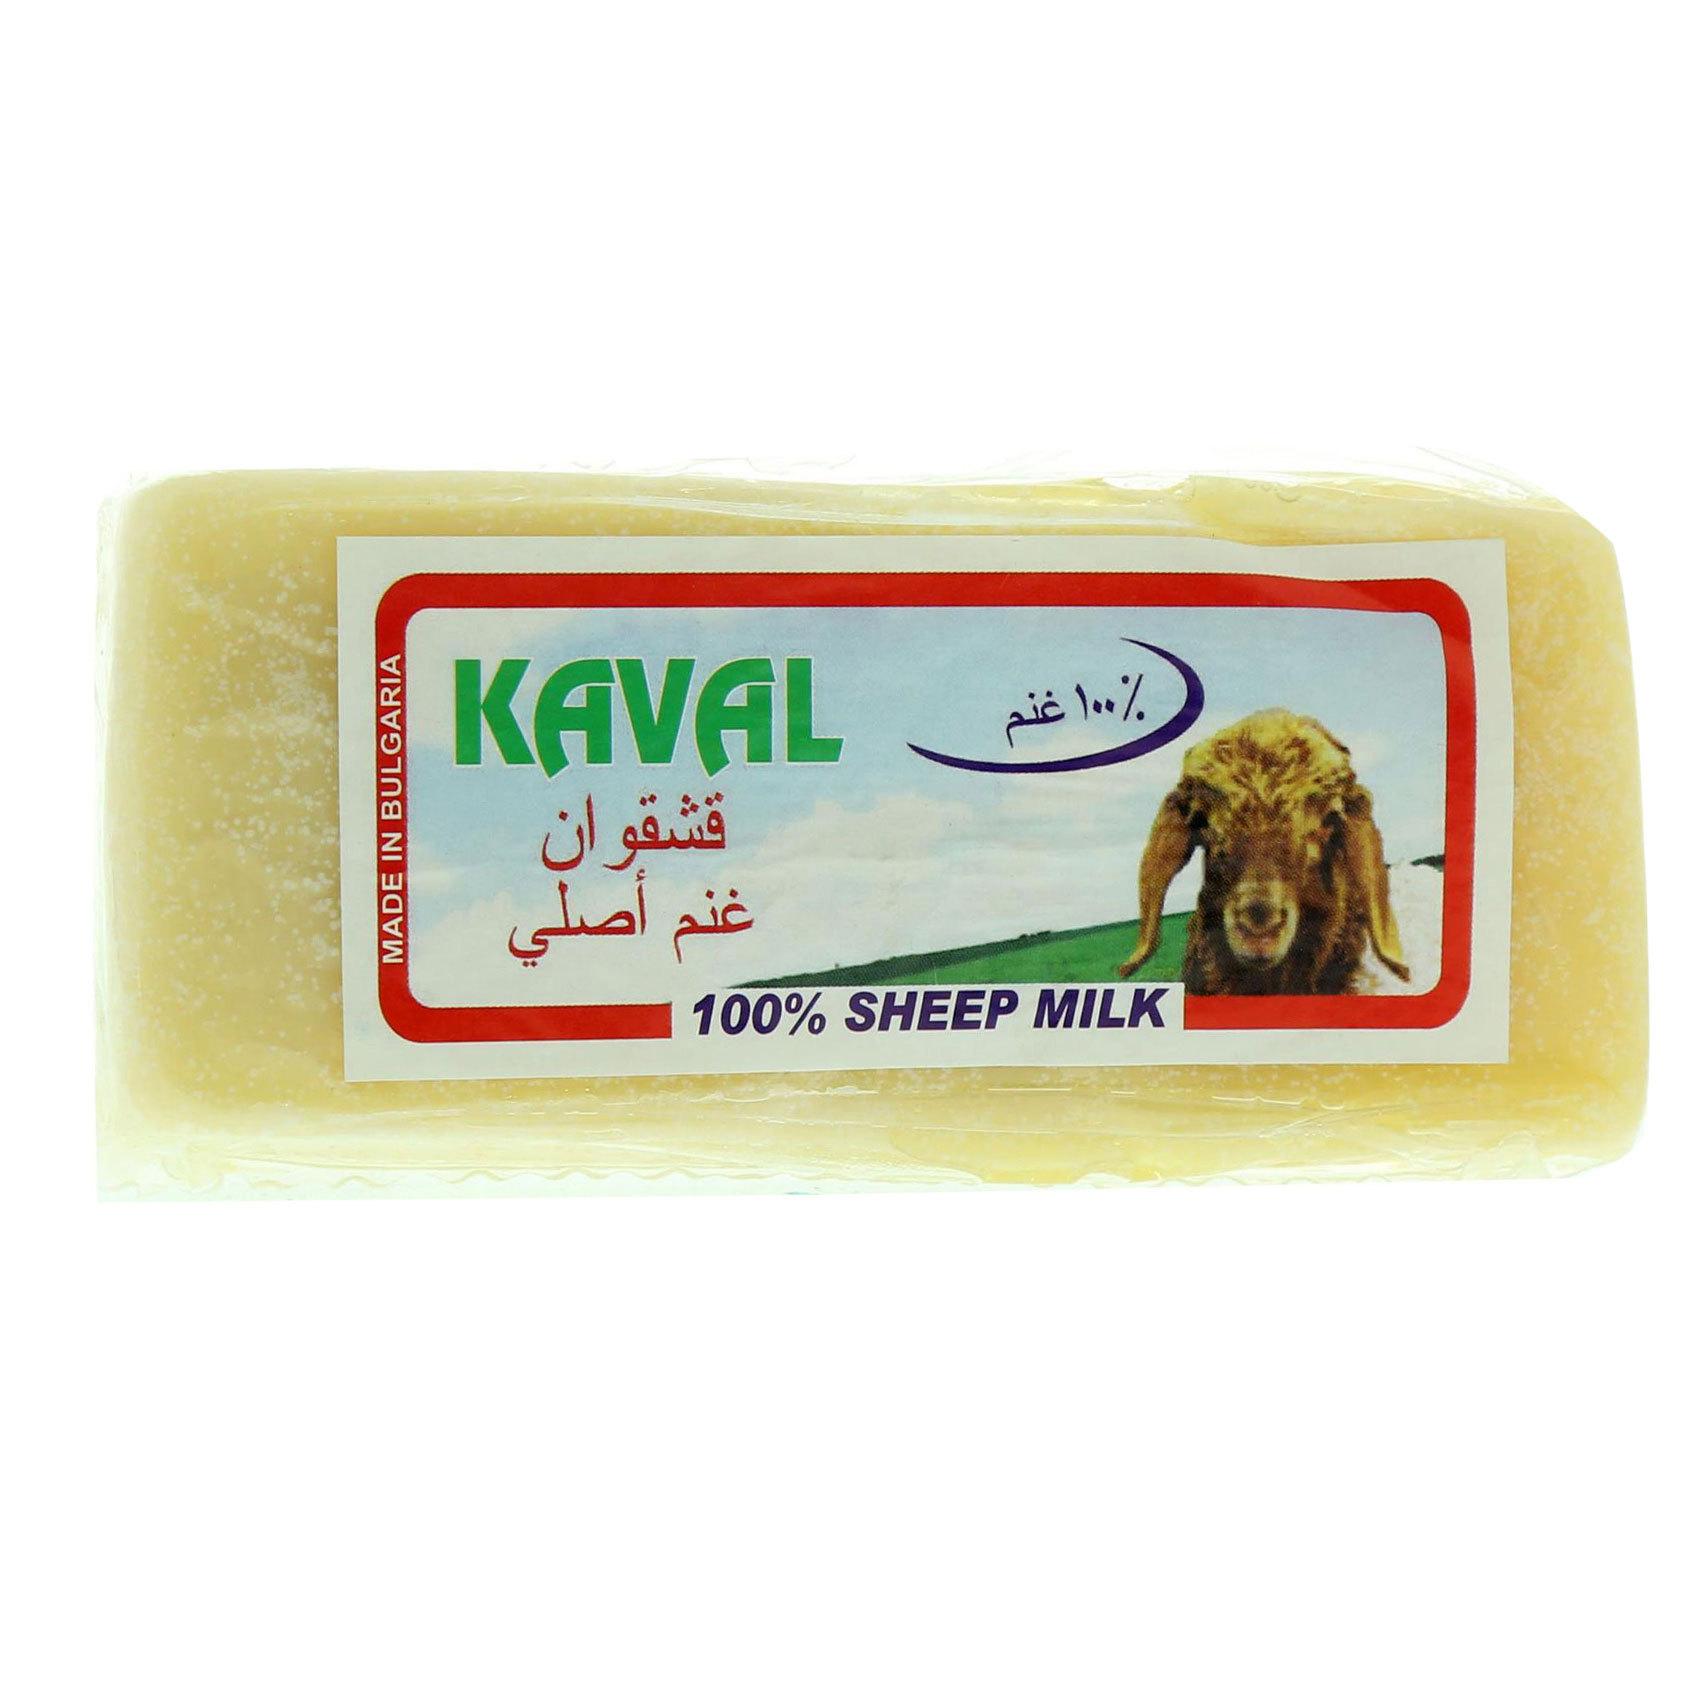 KASHKAVAL SHEEP 275G